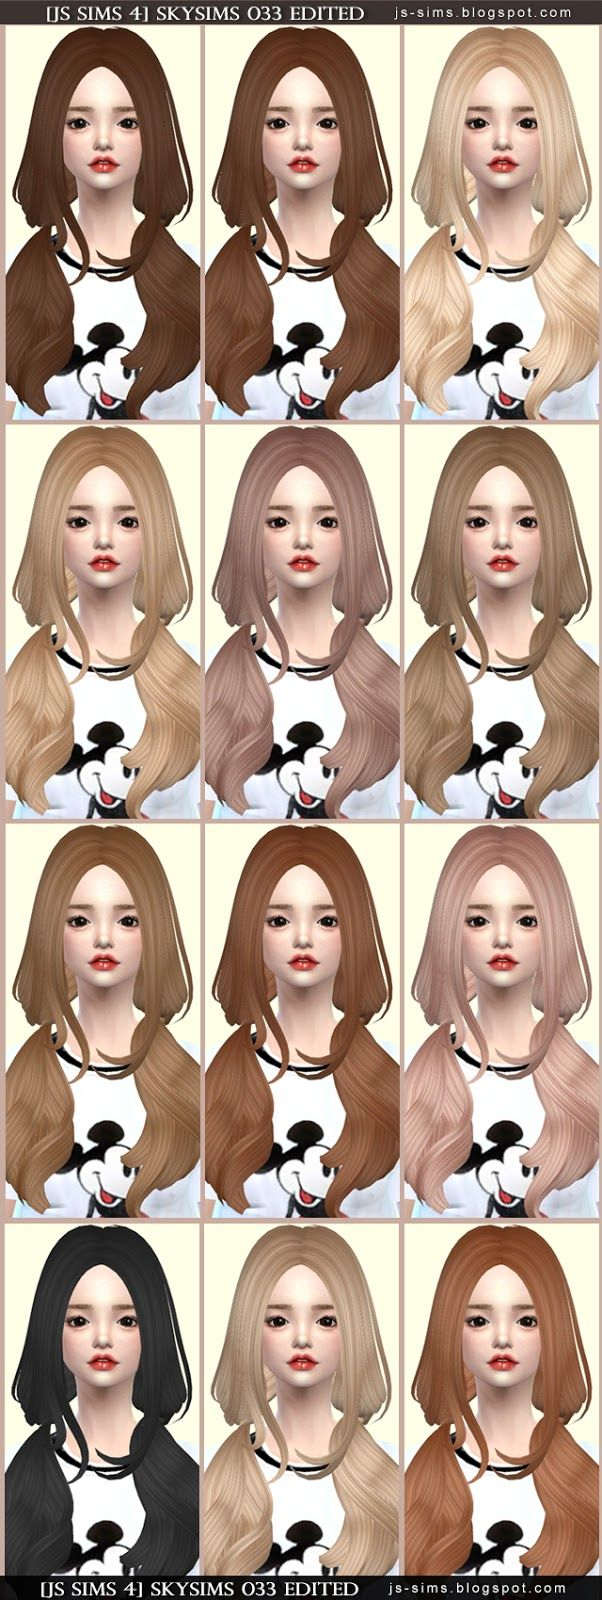 JS Sims 4: Skysims 033 hair retextured  - Sims 4 Hairs - http://sims4hairs.com/js-sims-4-skysims-033-hair-retextured/